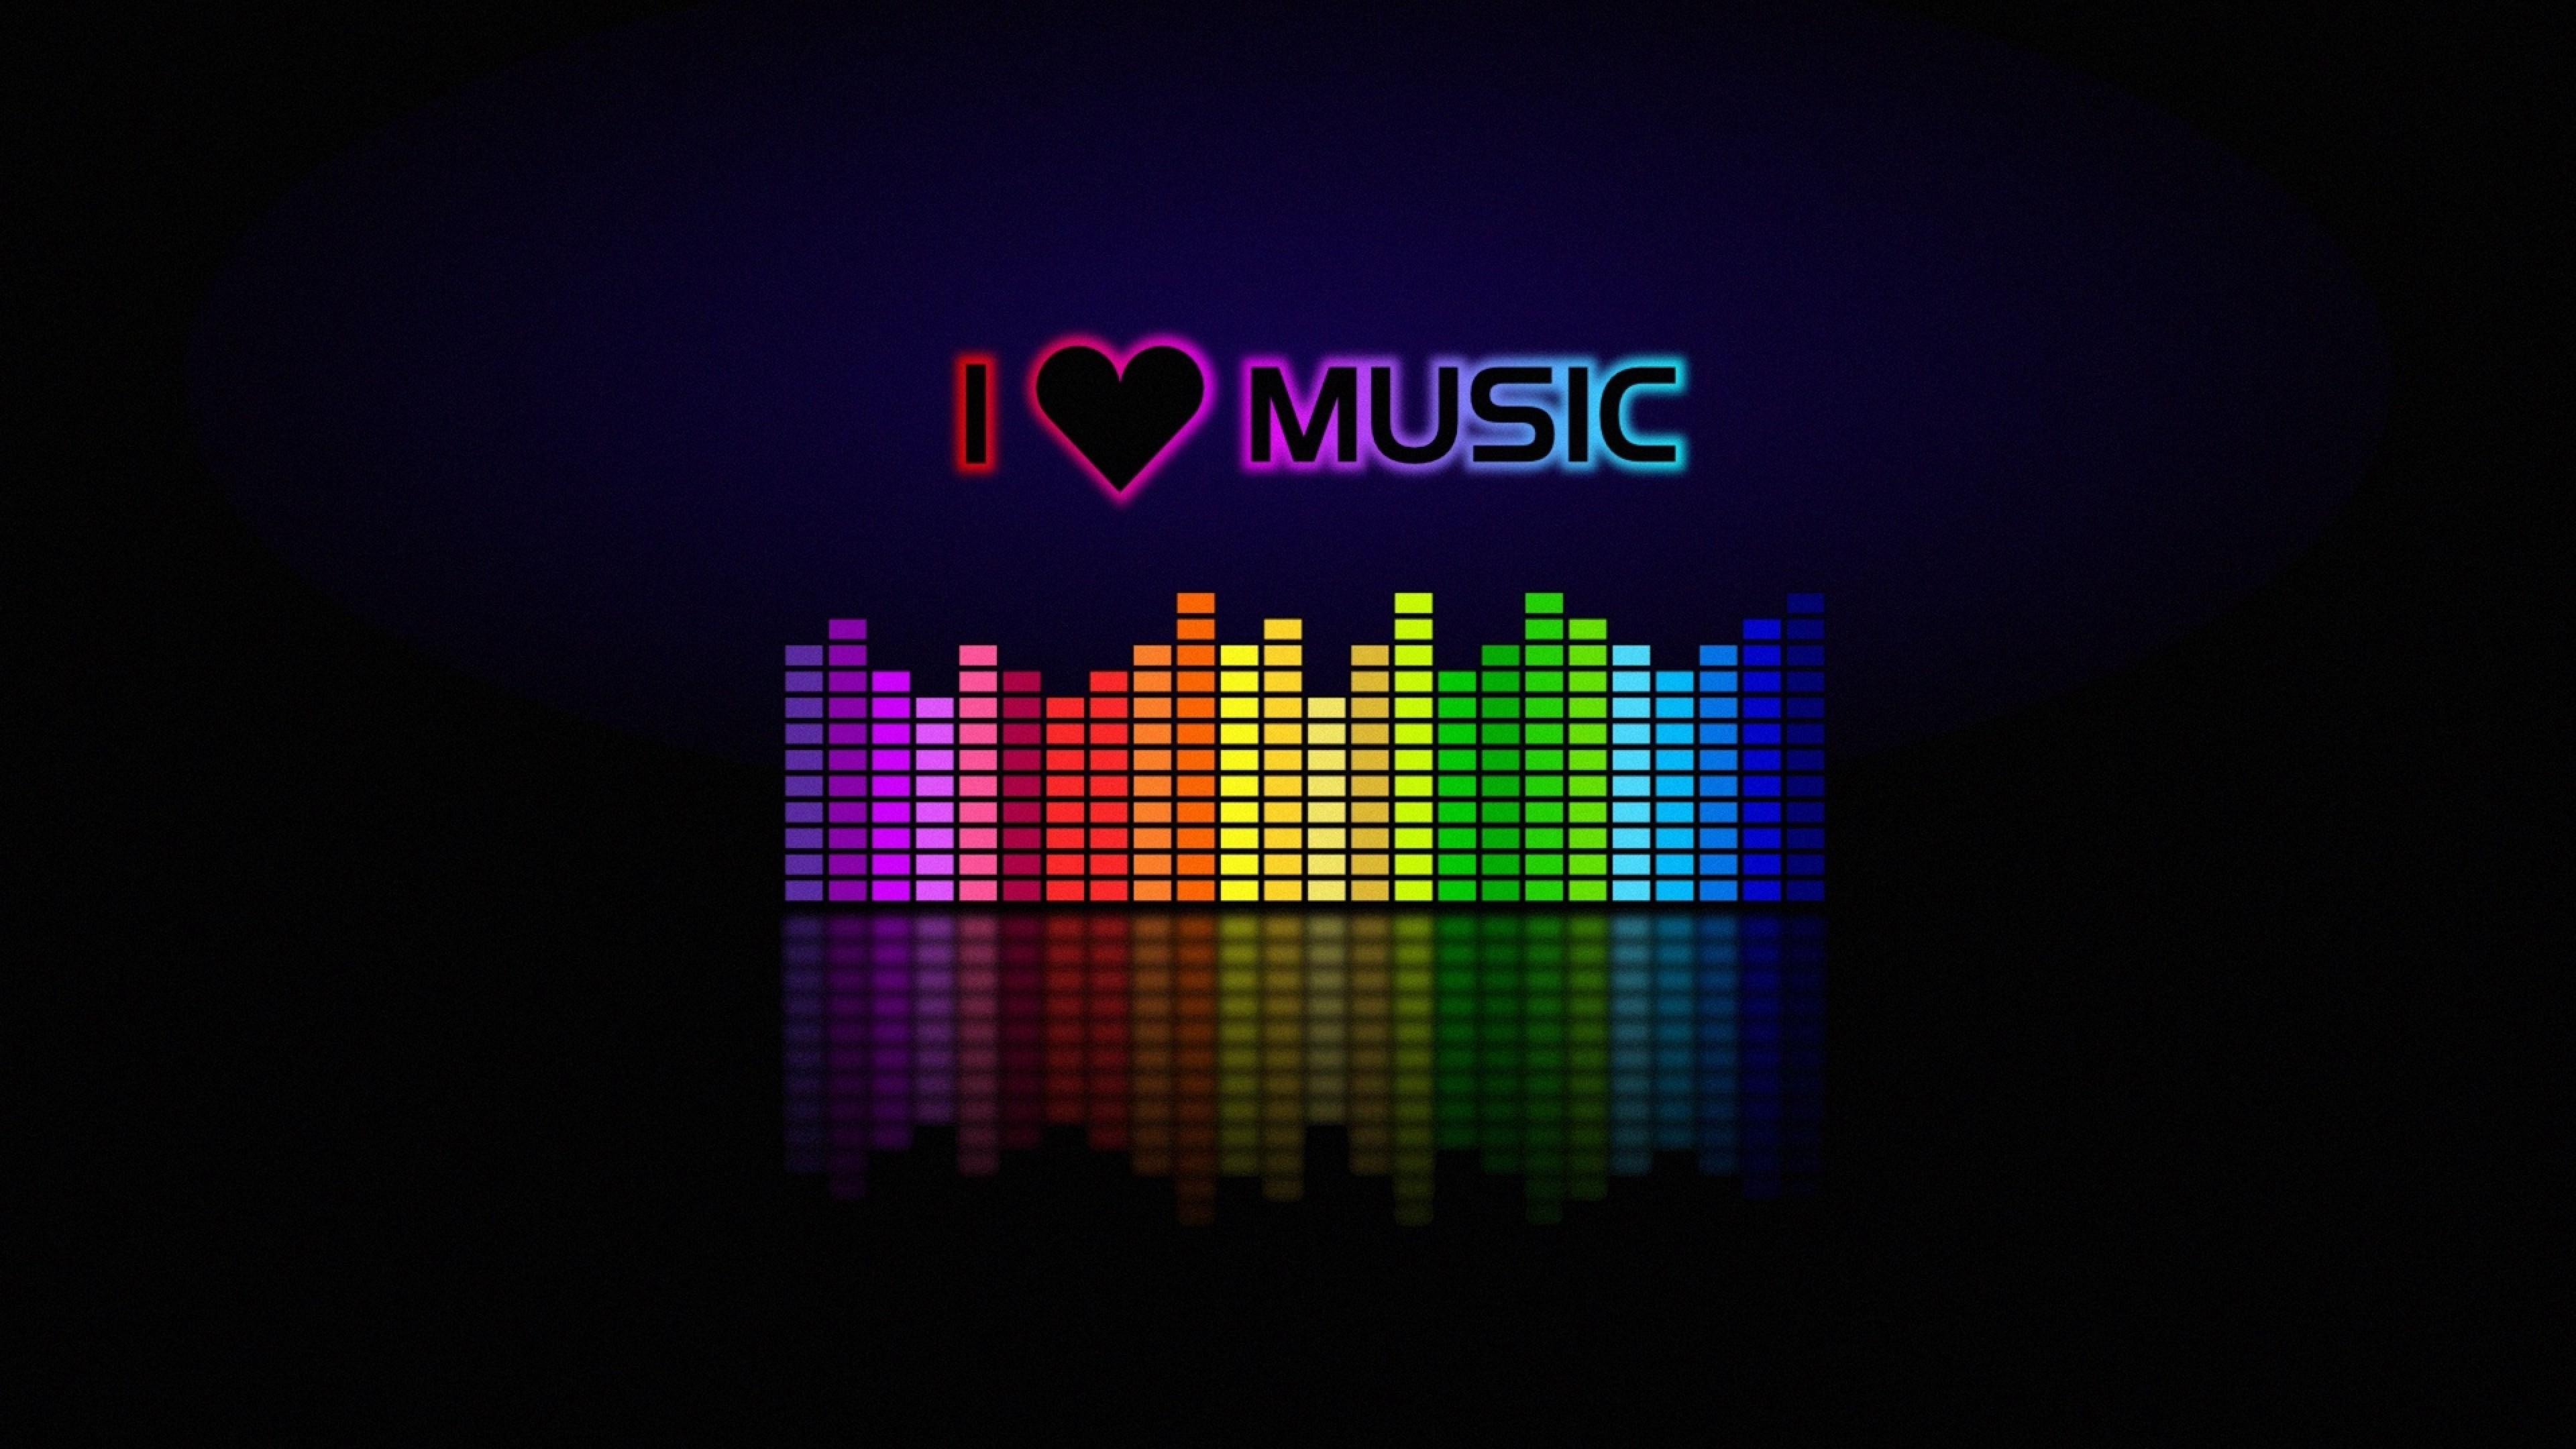 4k Ultra Hd Music Wallpaper 4k - 3840x2160 - Download HD ...